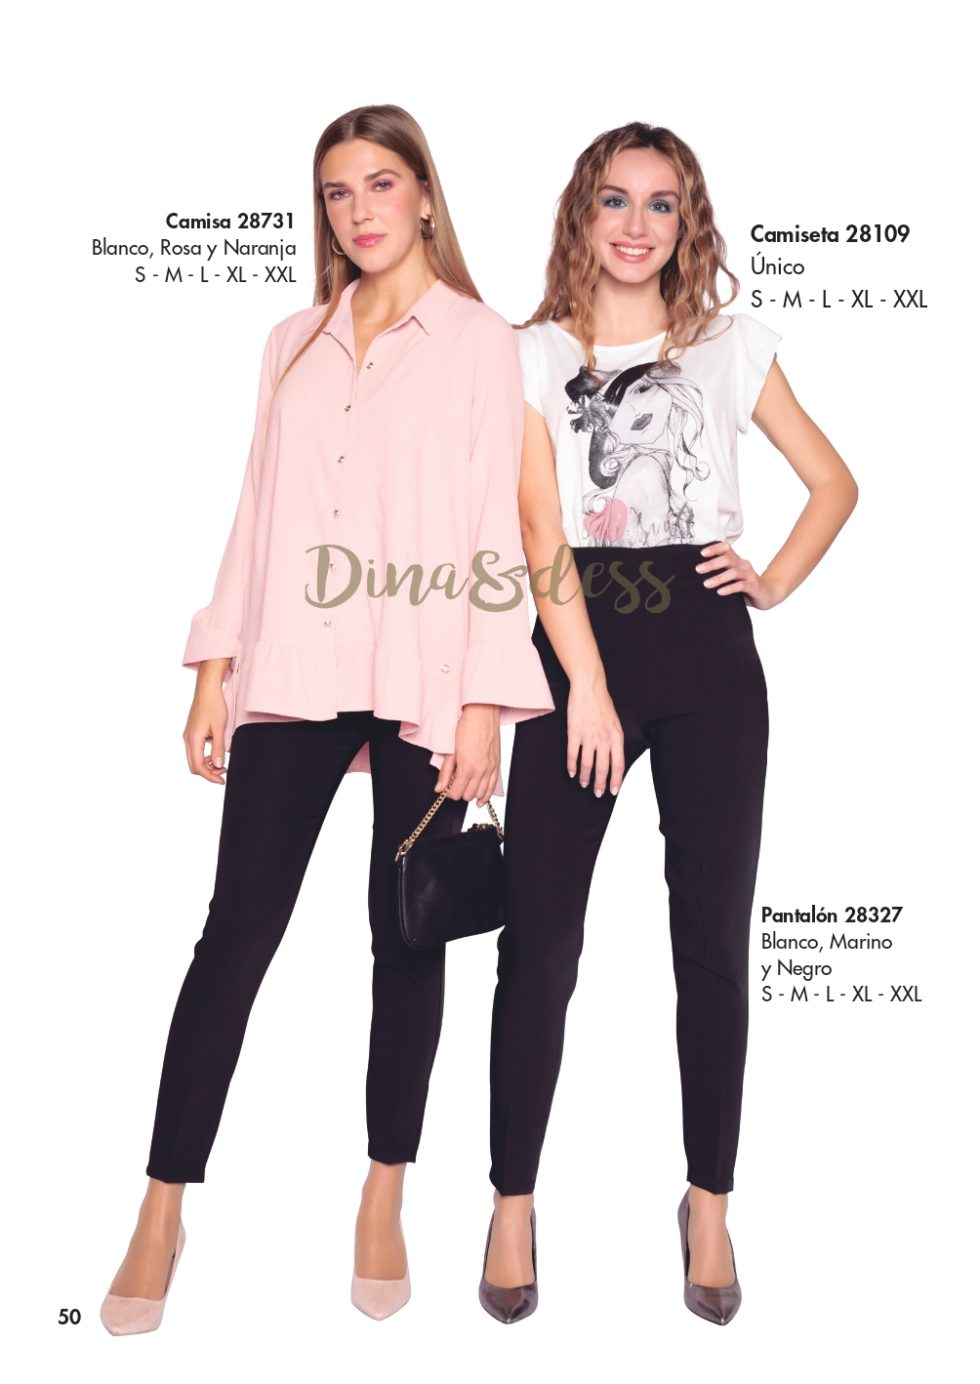 Verano 2021 Dina&Dess Clientes_page-0052